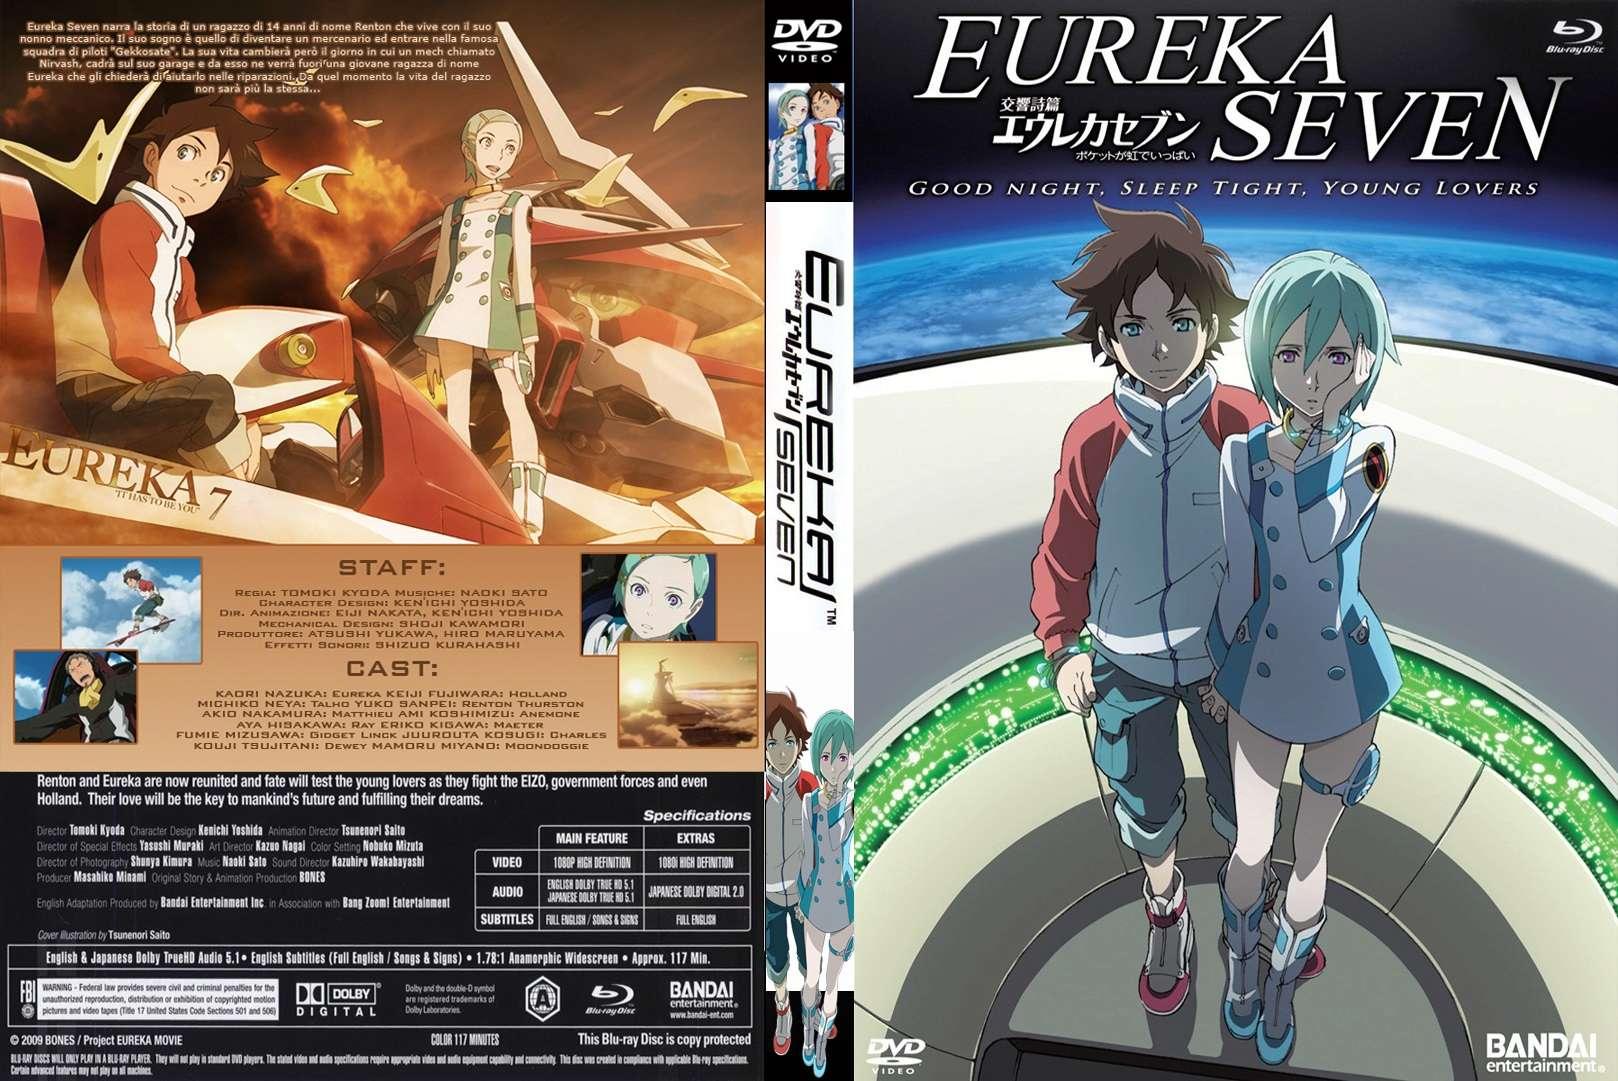 Caratula-COVER   Eureka Seven en DVD COMPLETA Eureka10